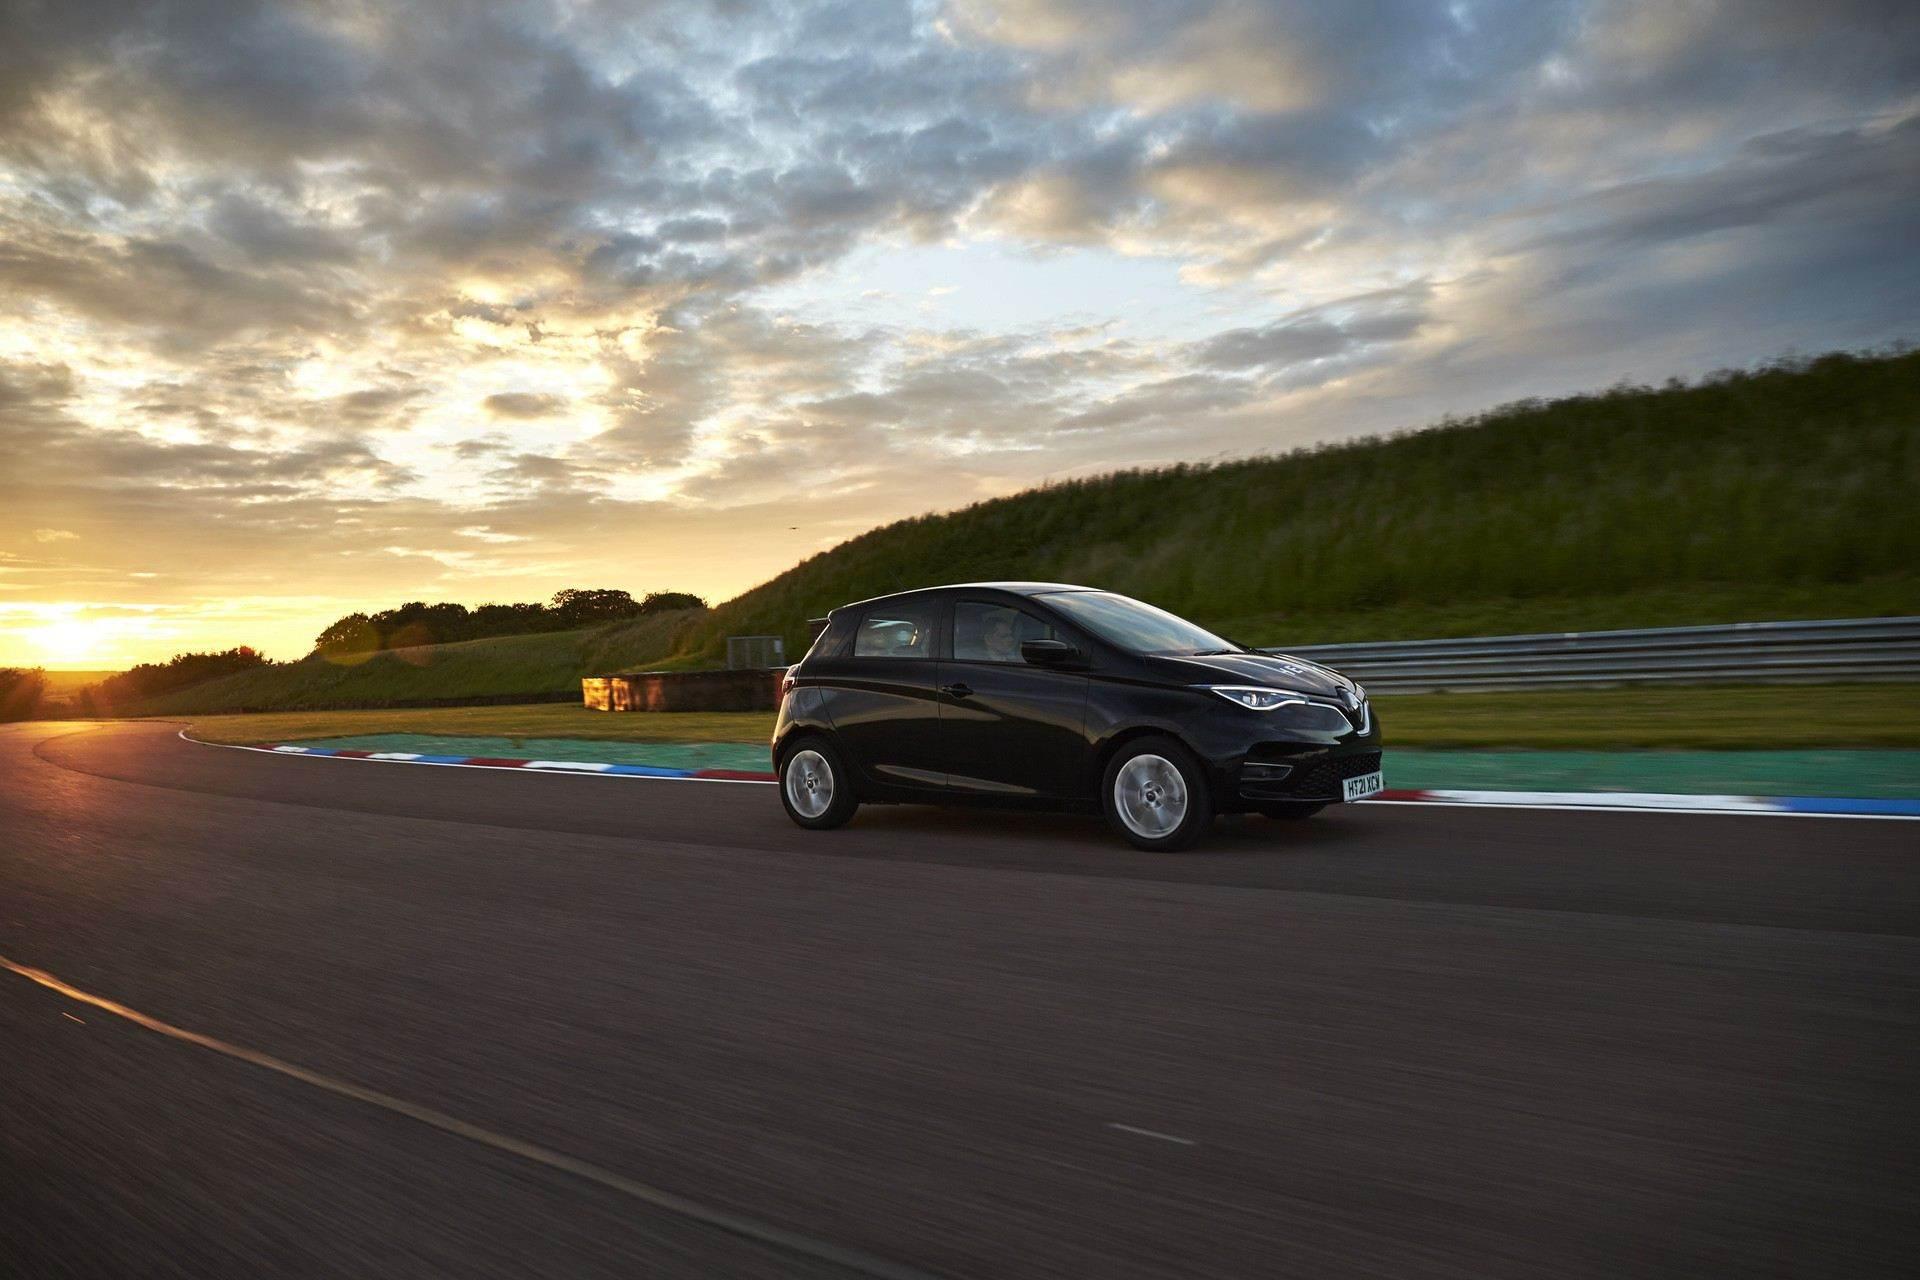 Renault_Zoe_hypermiling_record-0007